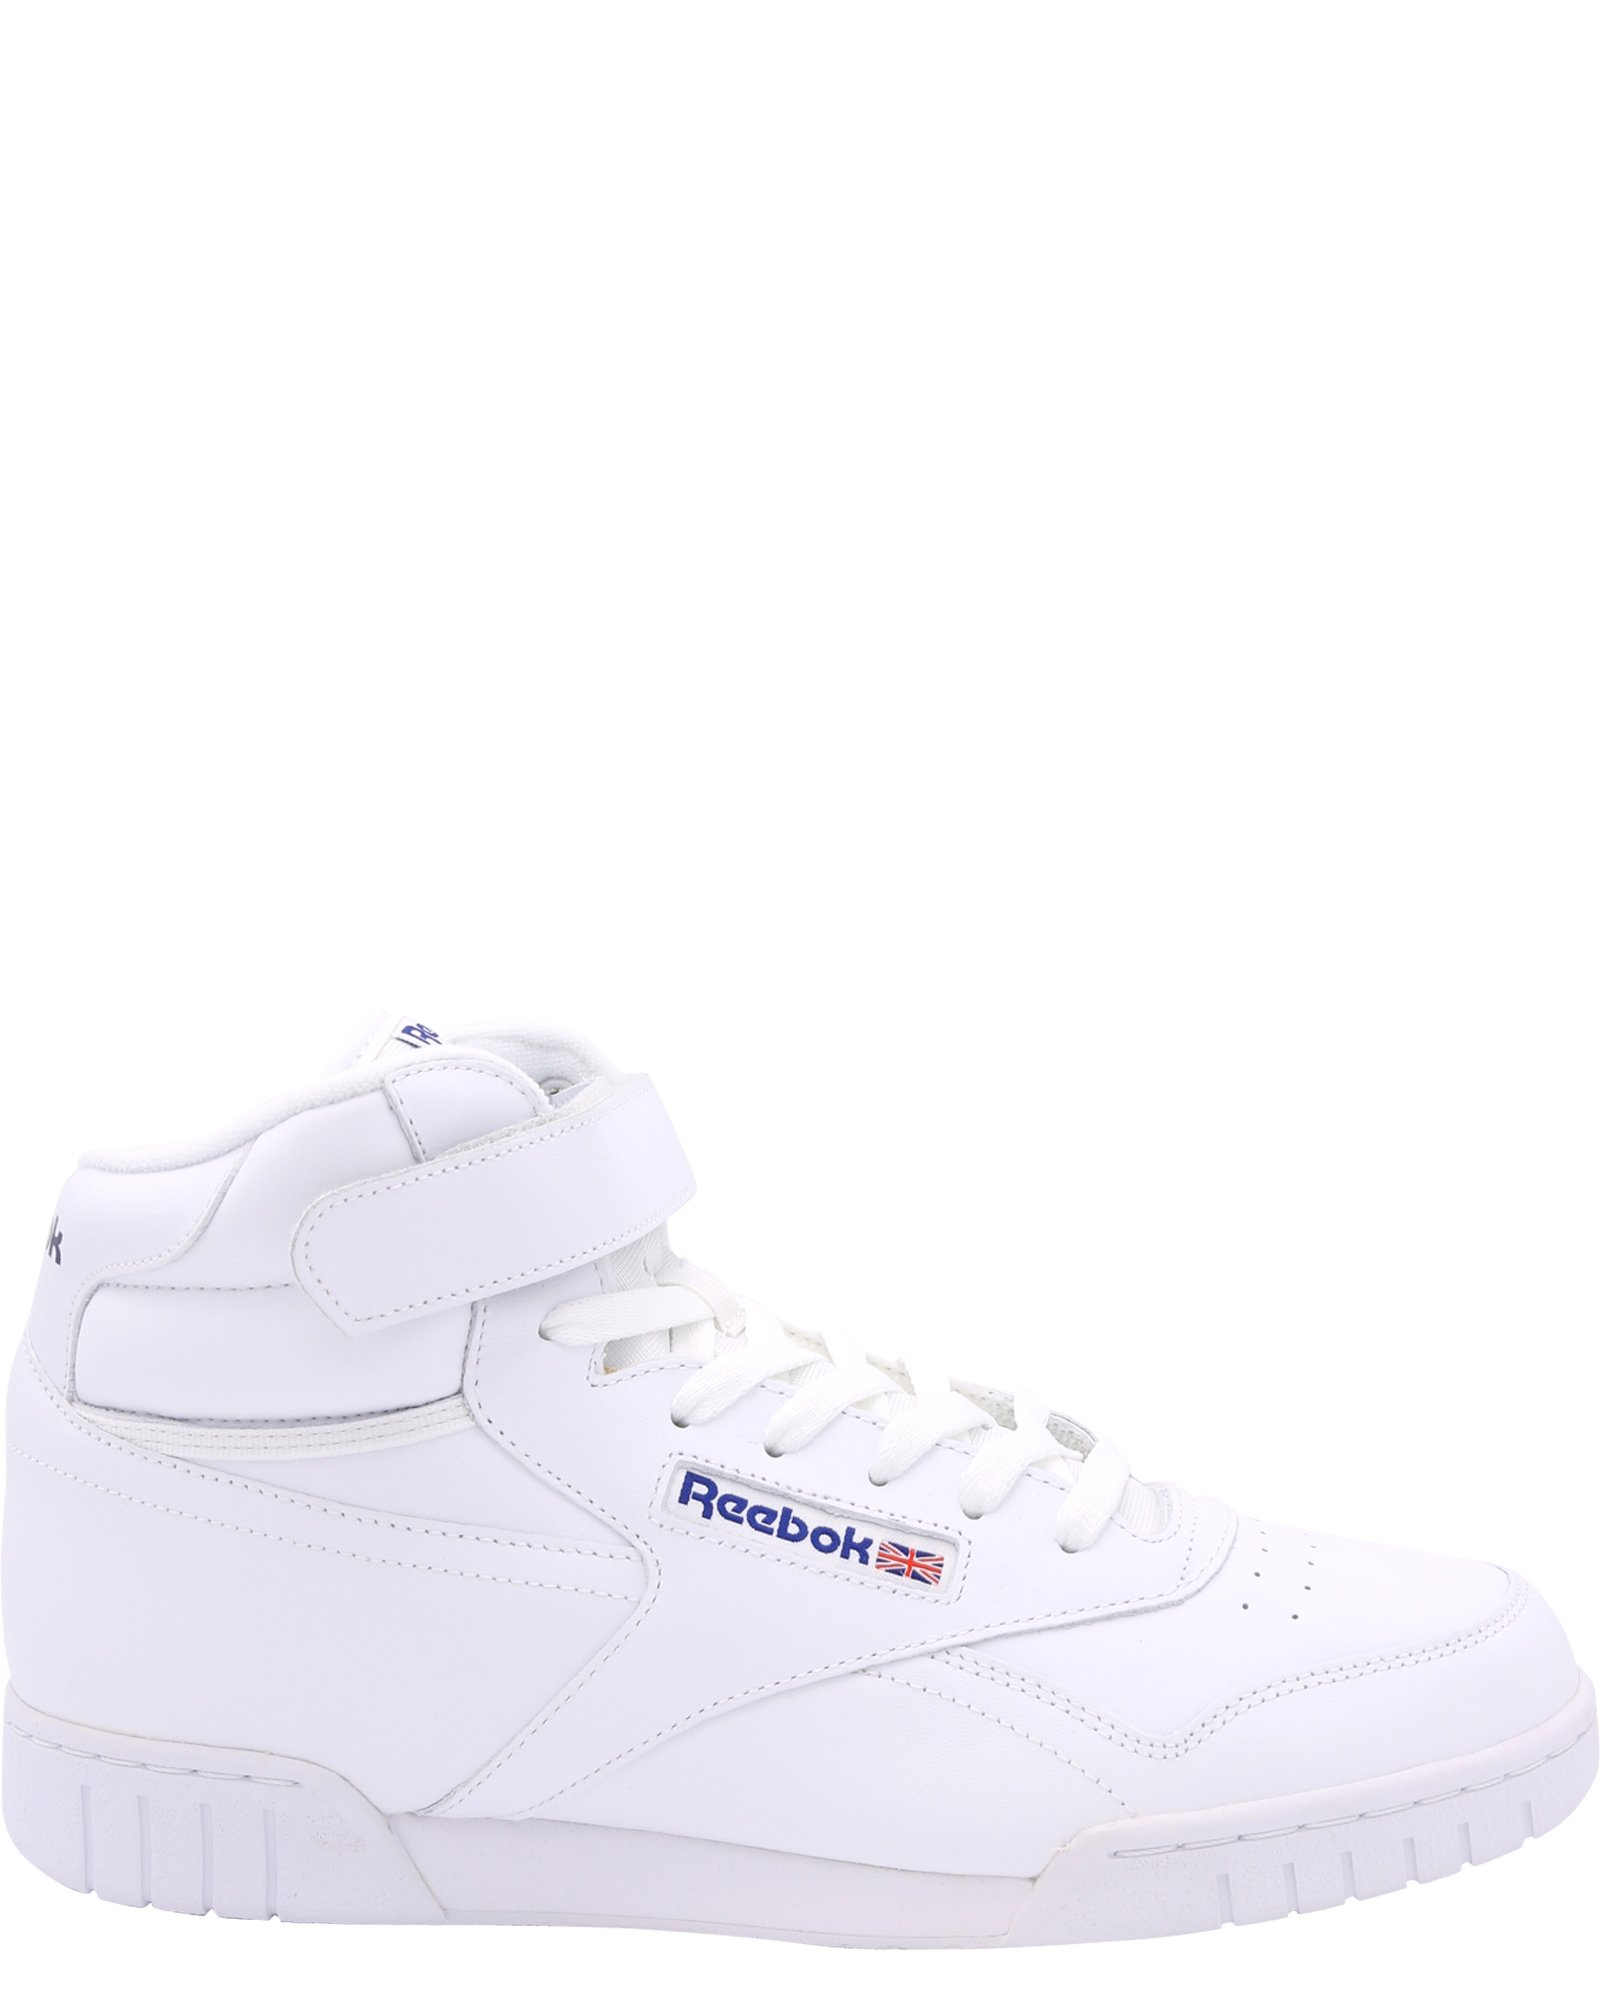 Reebok Ex-O-Fit Hi Womens Sneaker White 3477, Size:41